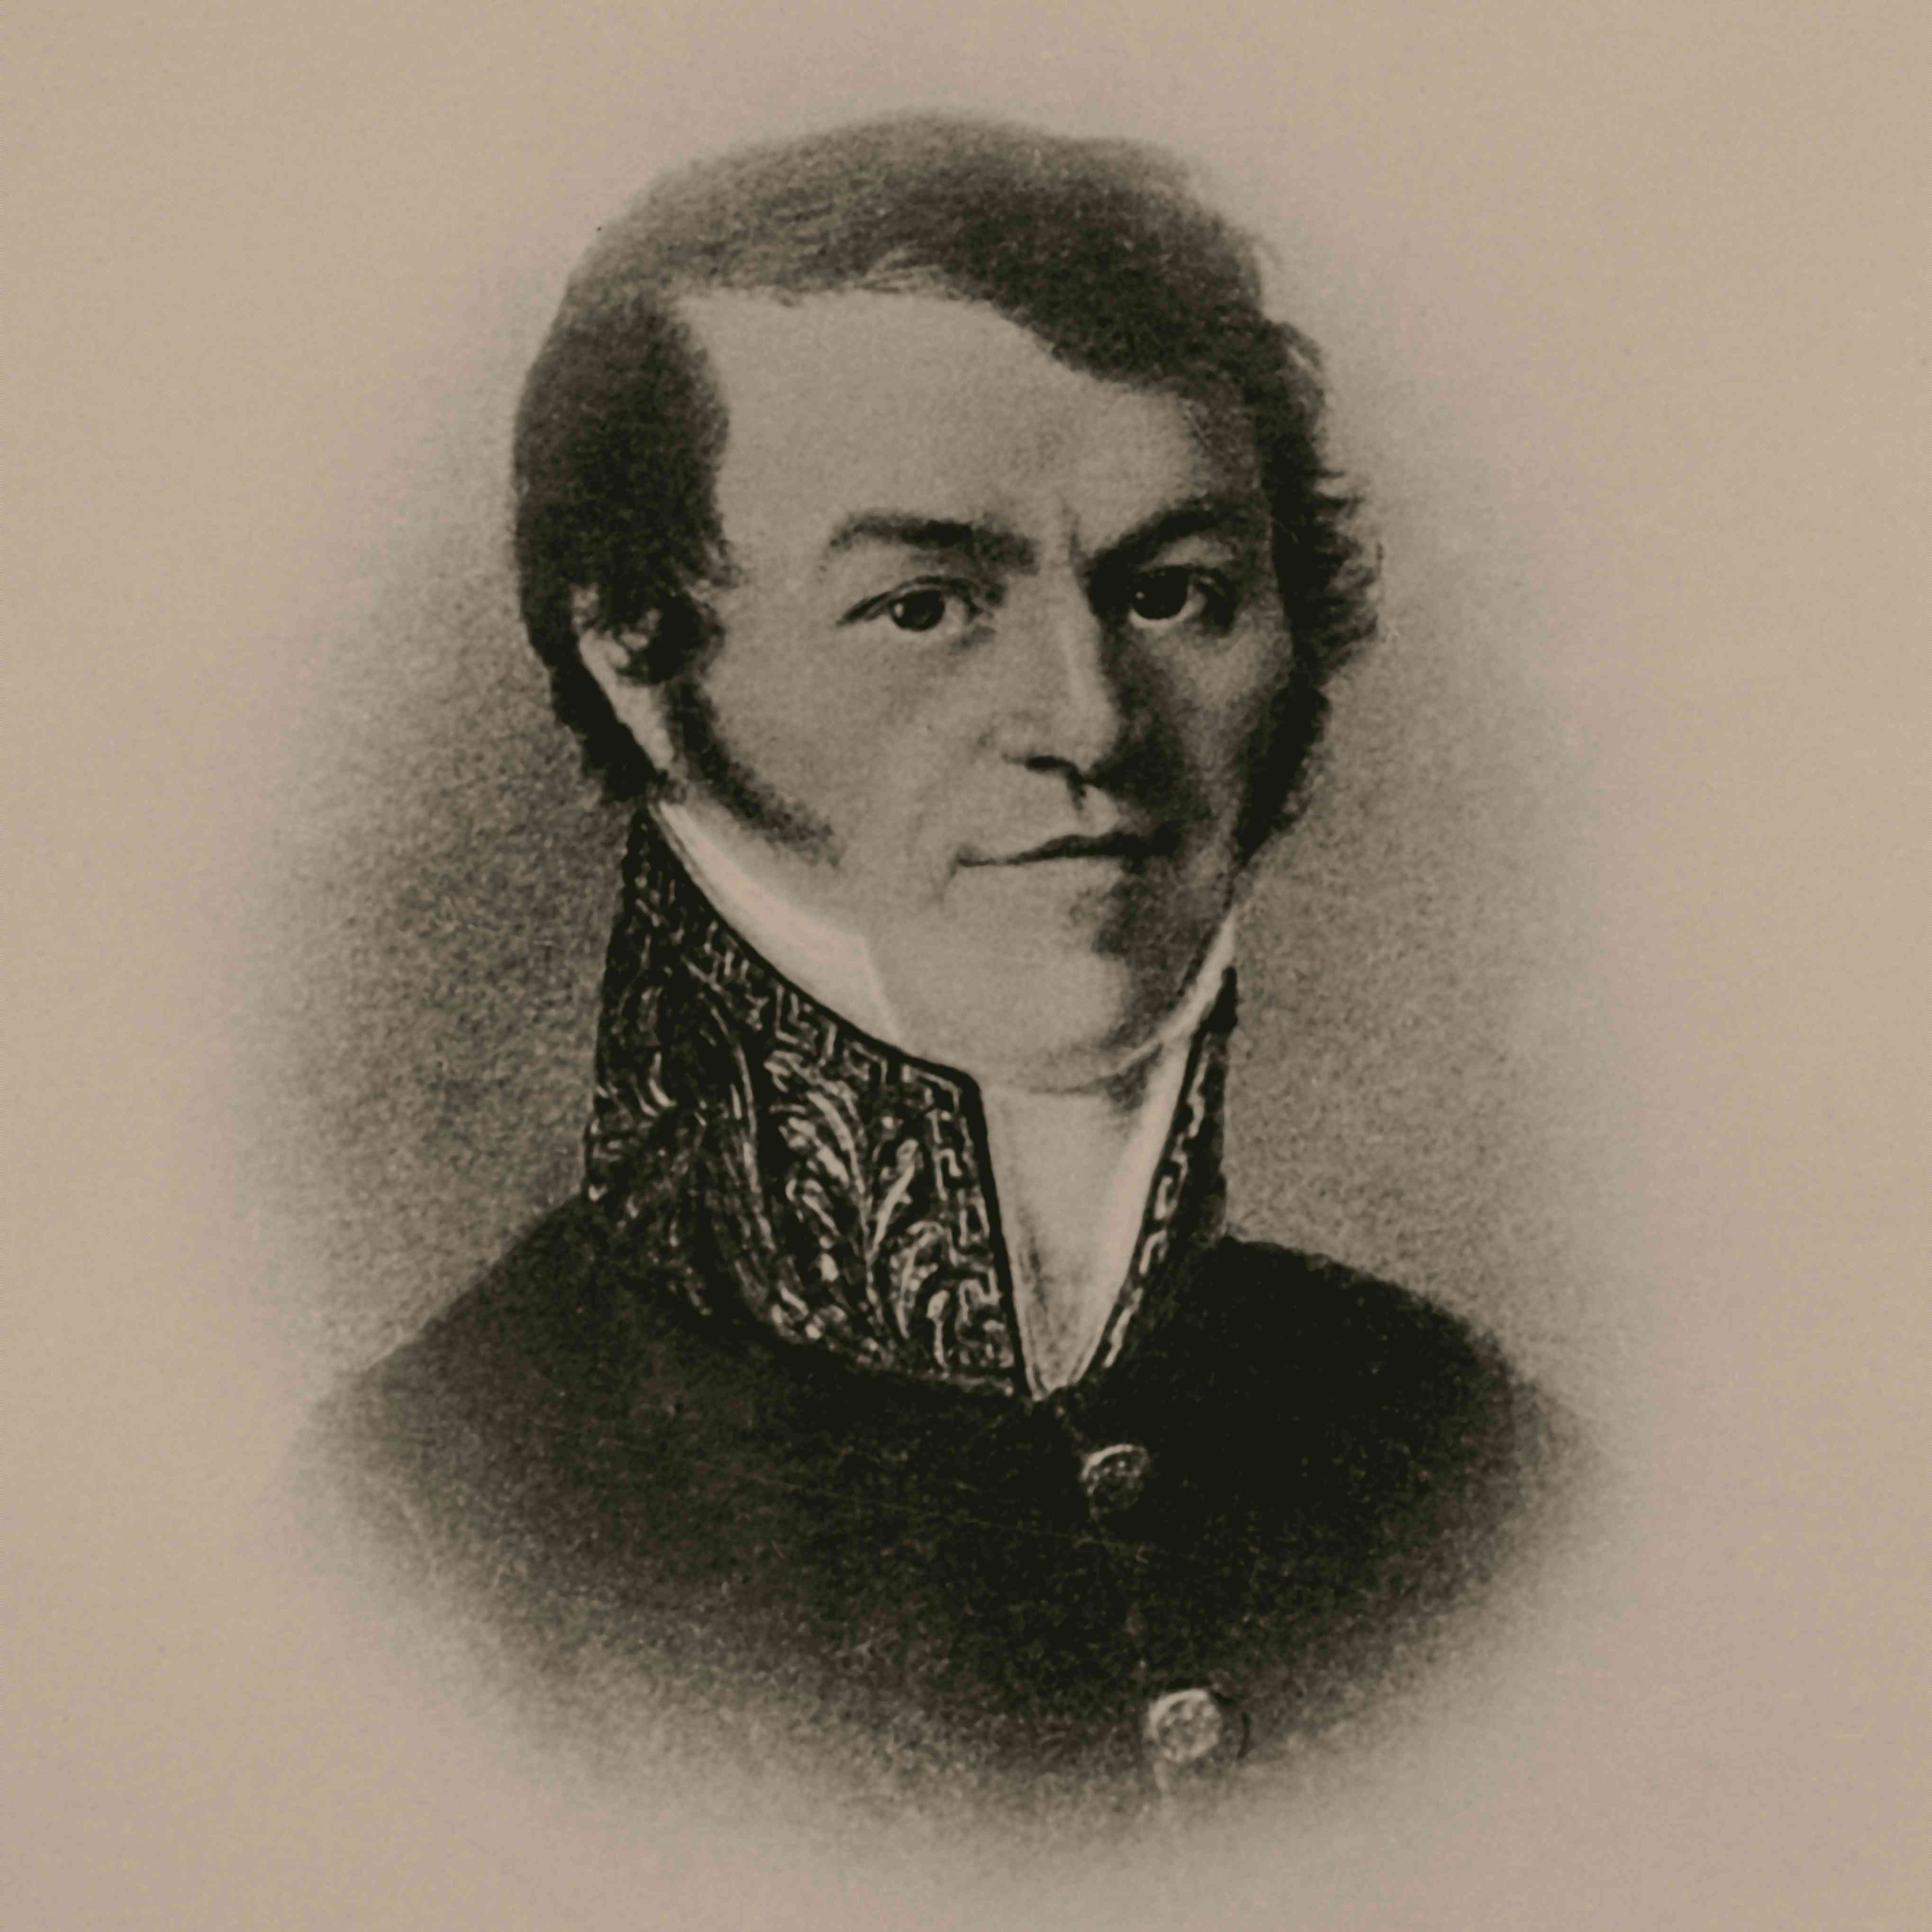 Head and shoulders portrait of Mikhail Dostoevsky